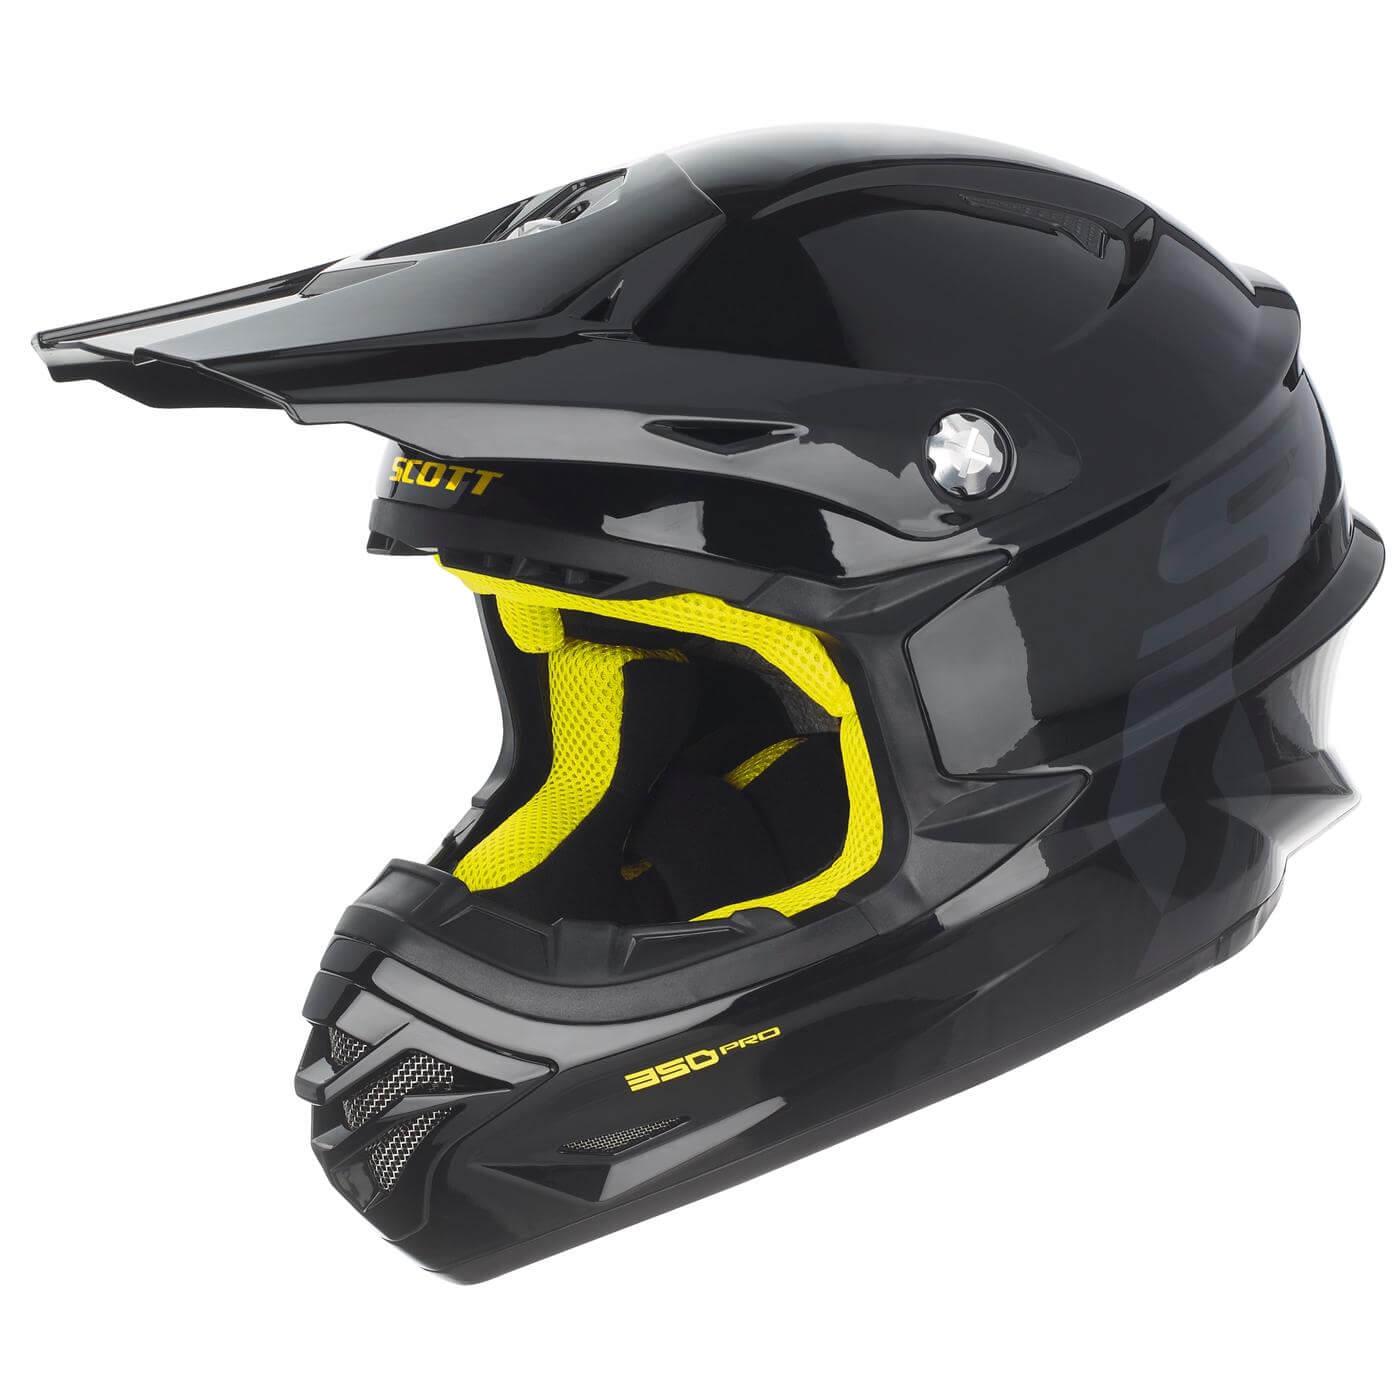 Scott 350 Pro Hjelm - Sort/Gul - XS